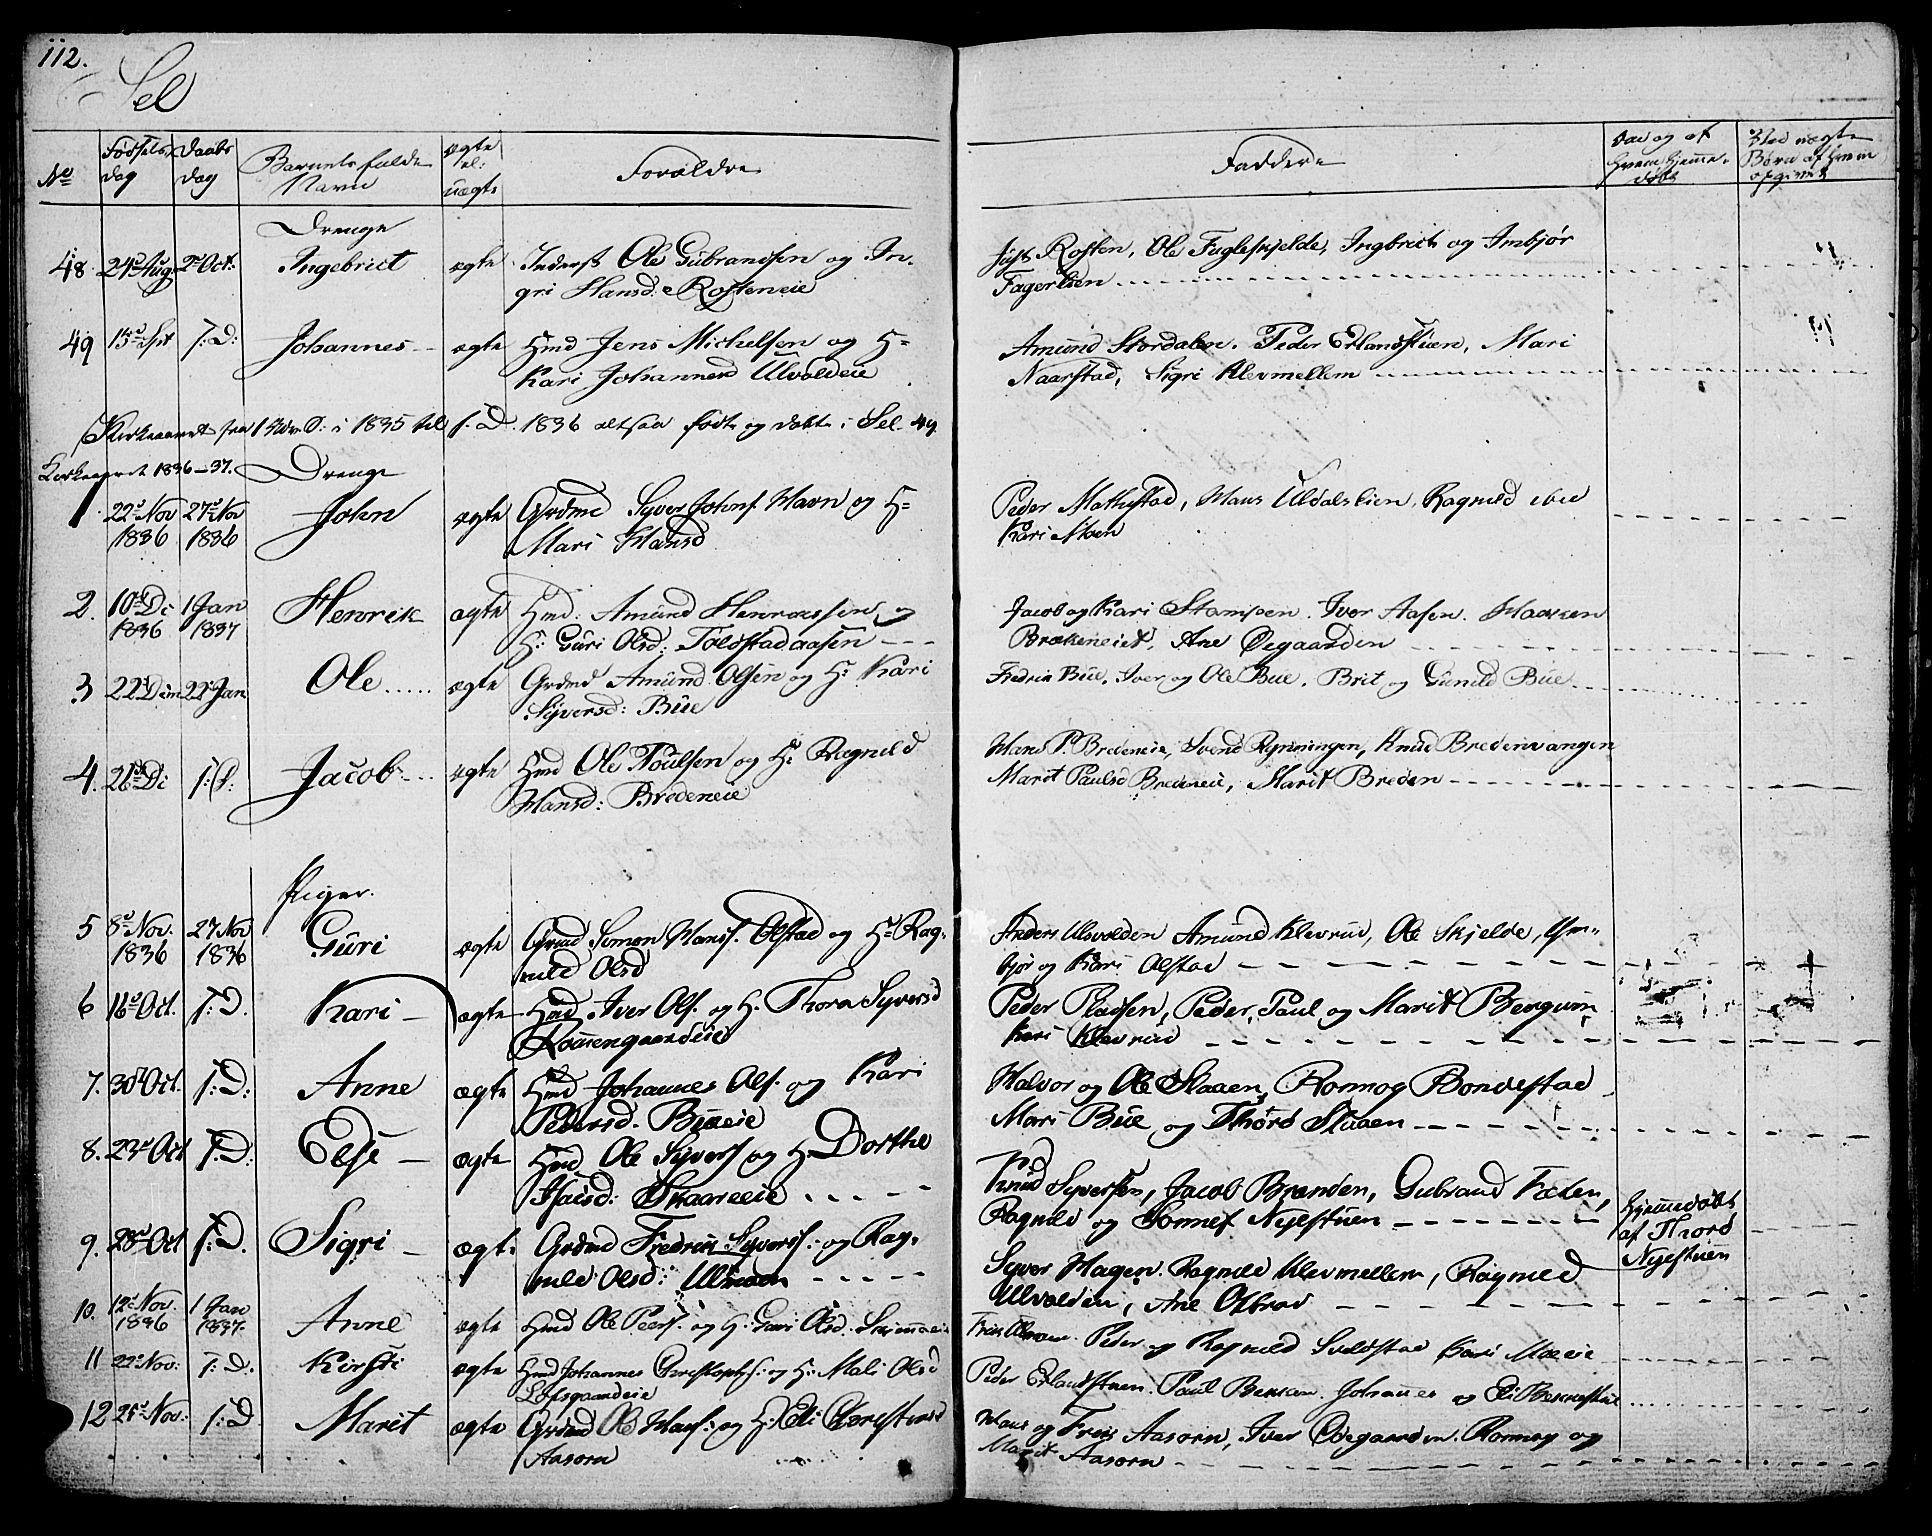 SAH, Vågå prestekontor, Ministerialbok nr. 4 /3, 1834-1842, s. 112